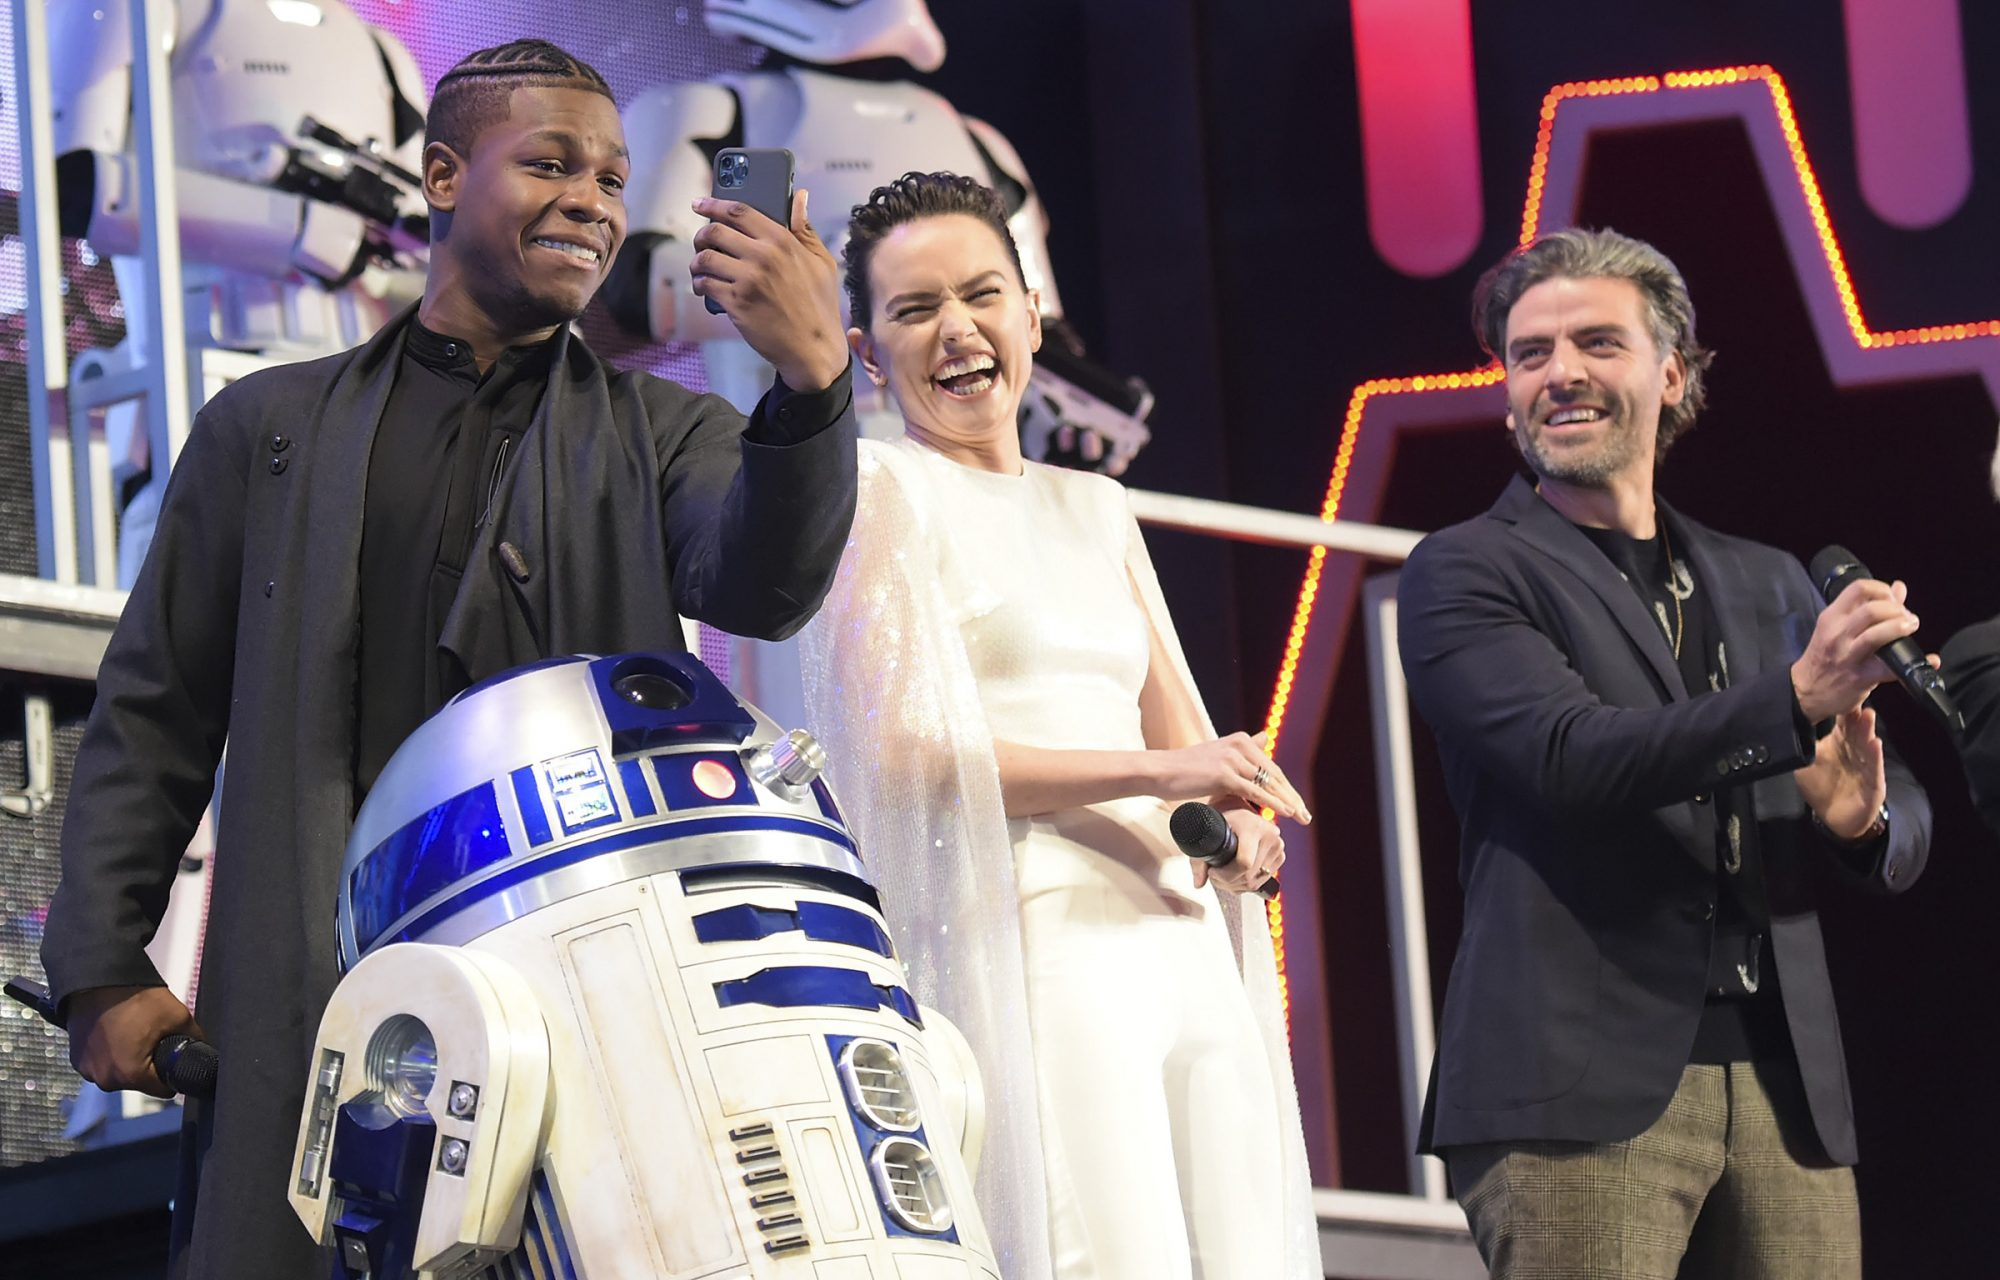 John Boyega, Daisy Ridley and Oscar Isaac